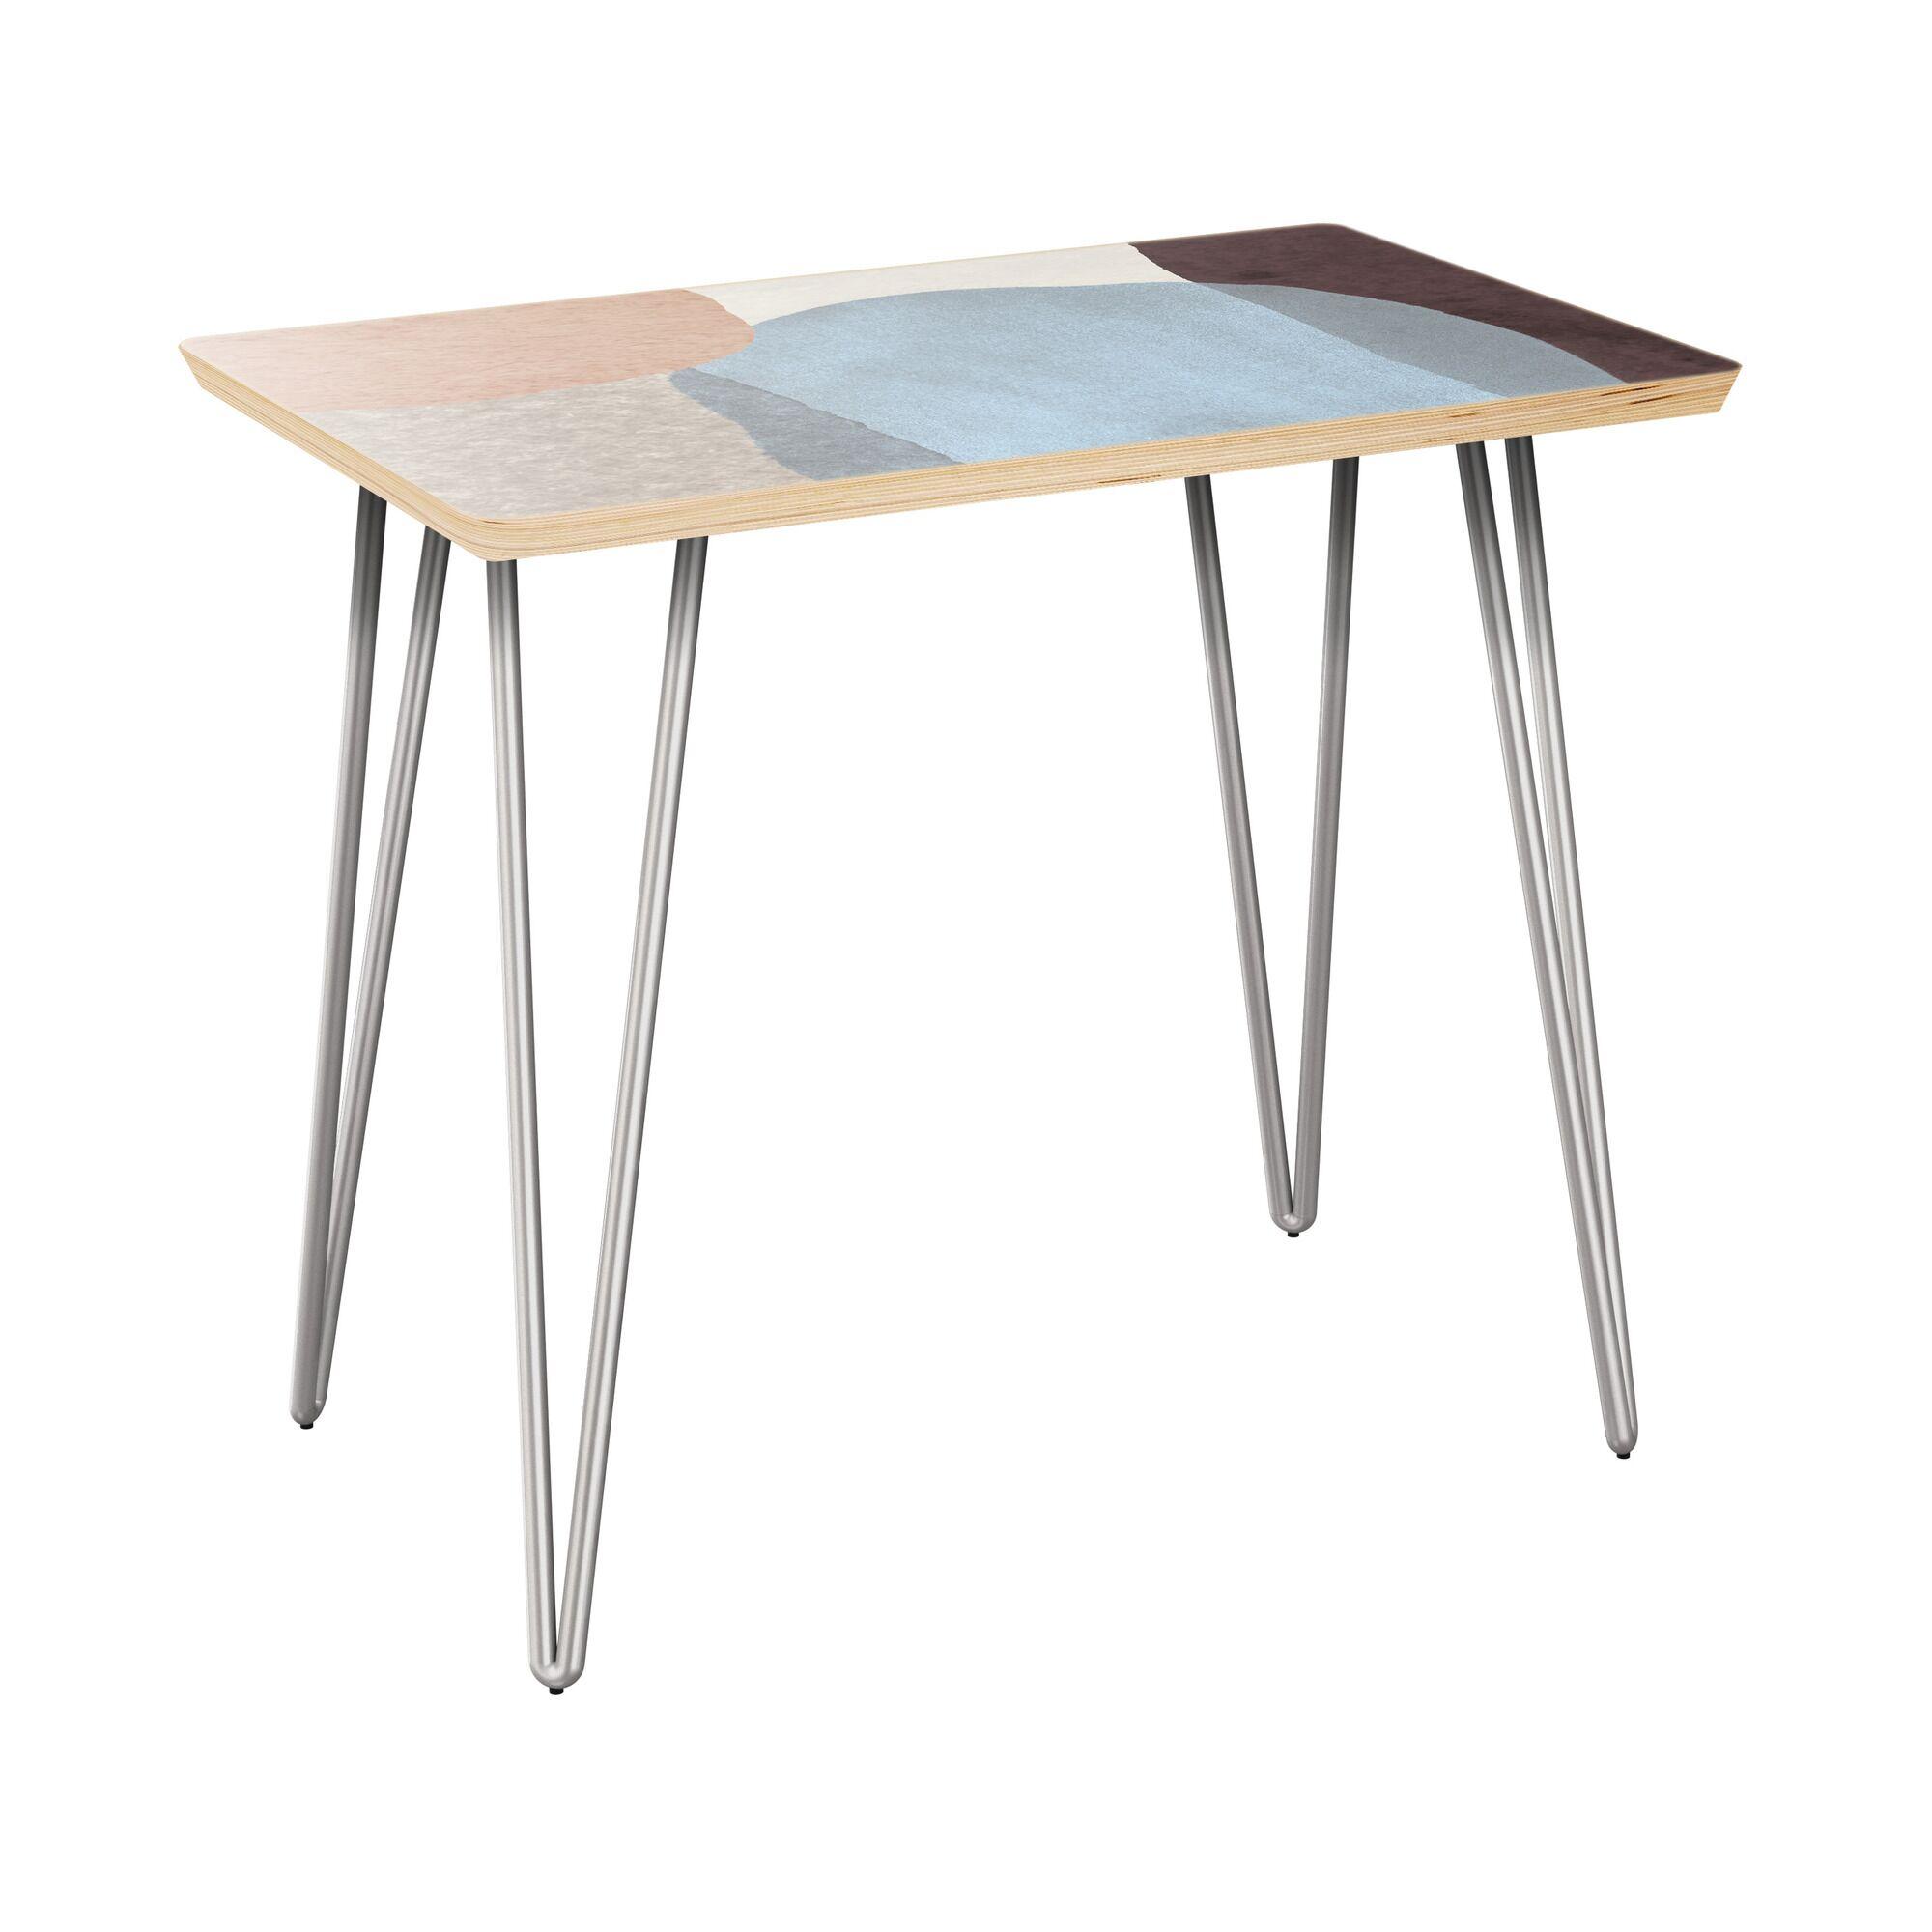 Failand End Table Table Top Color: Natural, Table Base Color: Chrome